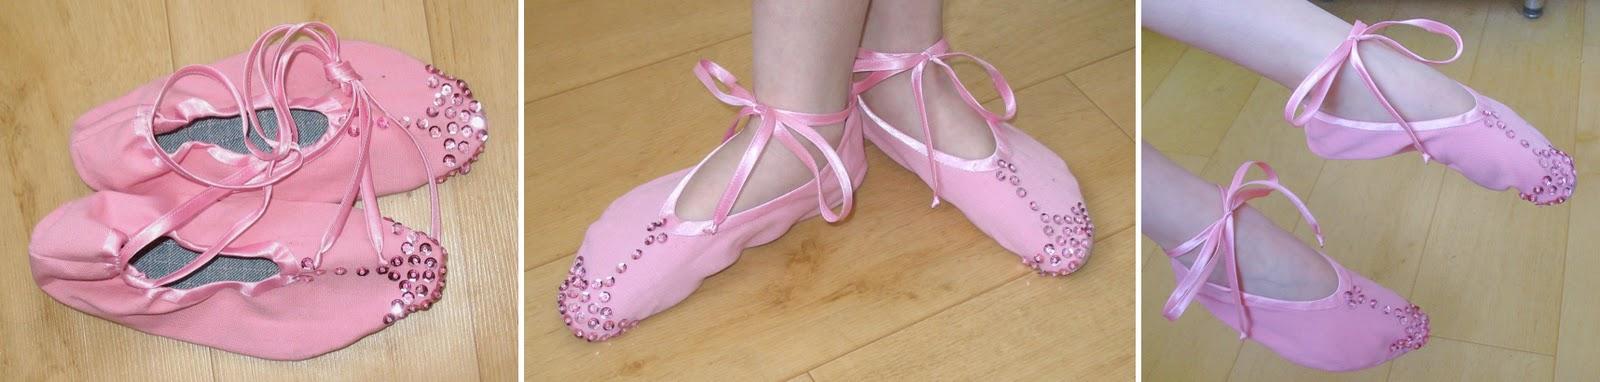 Выкройка балетки для танцев 26